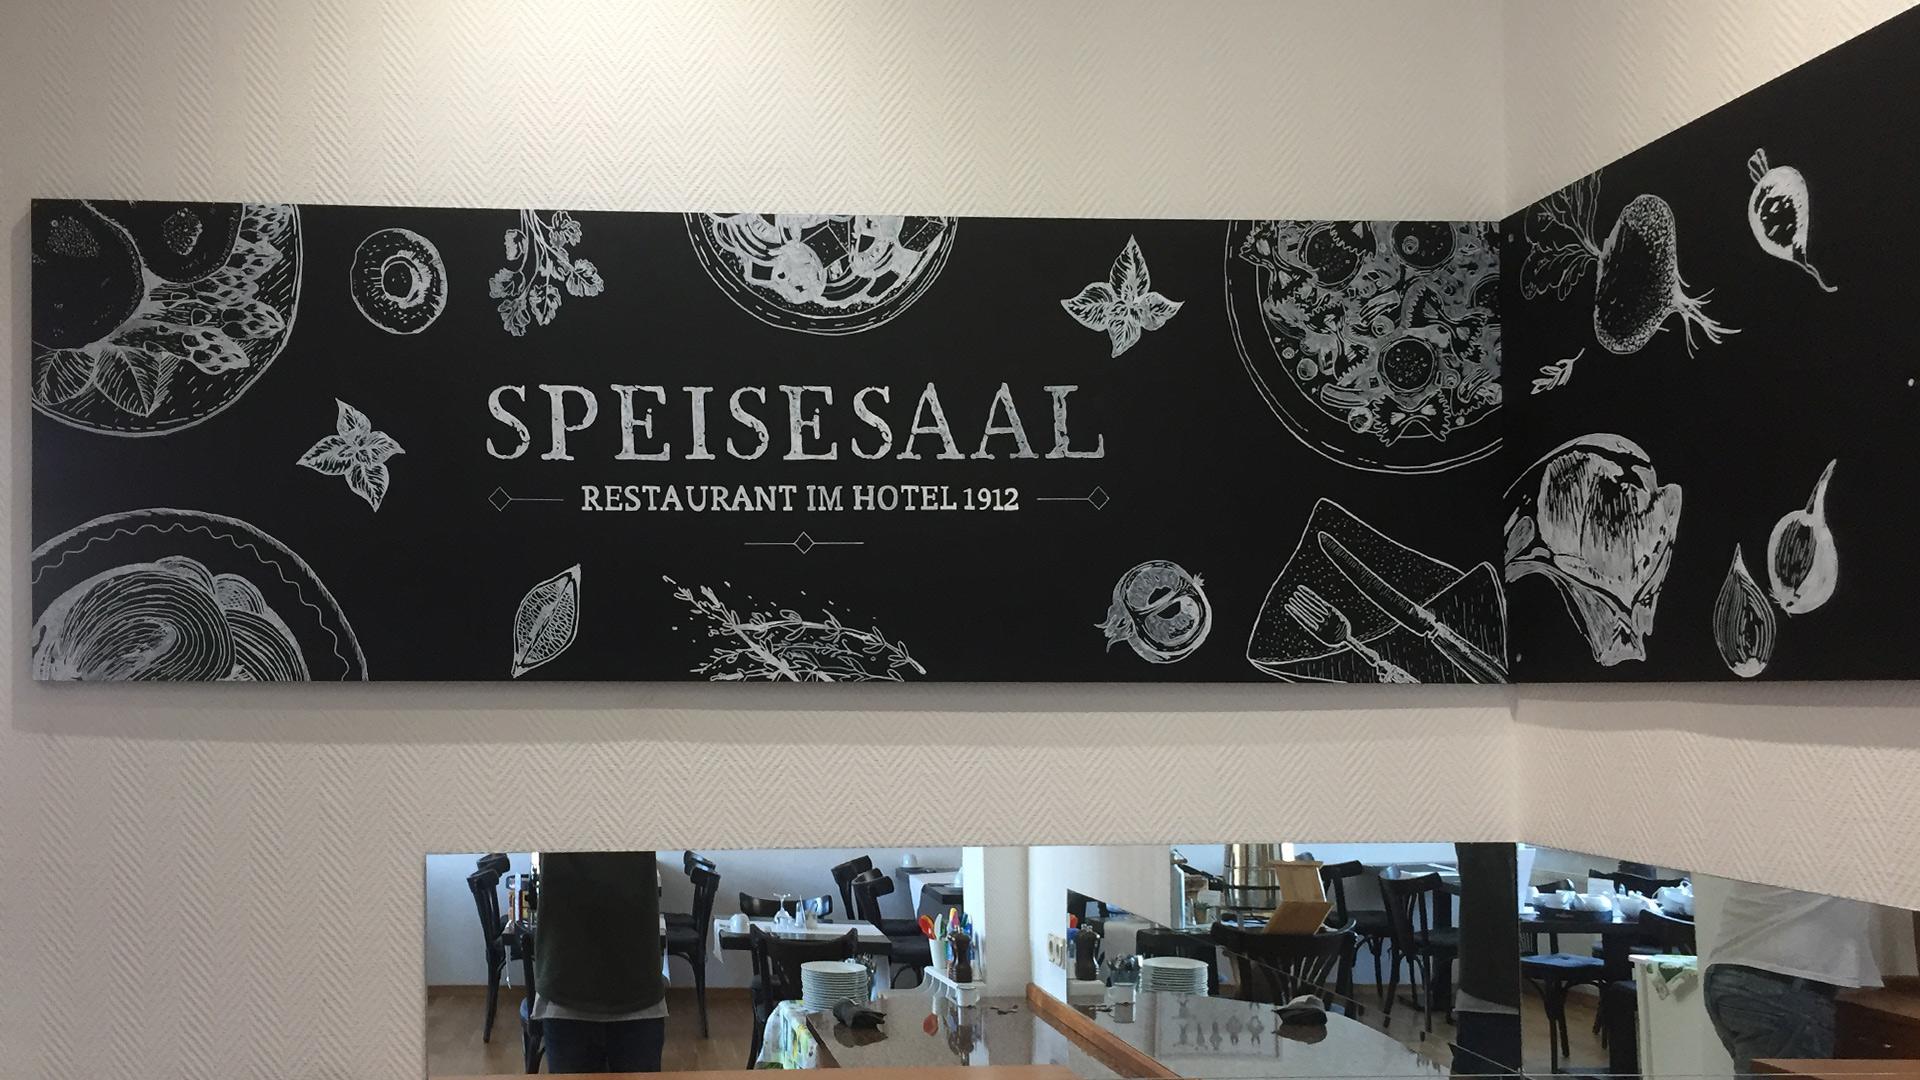 1912 Hotel – Speisesaal Restaurant – Tafel Illustration mitte